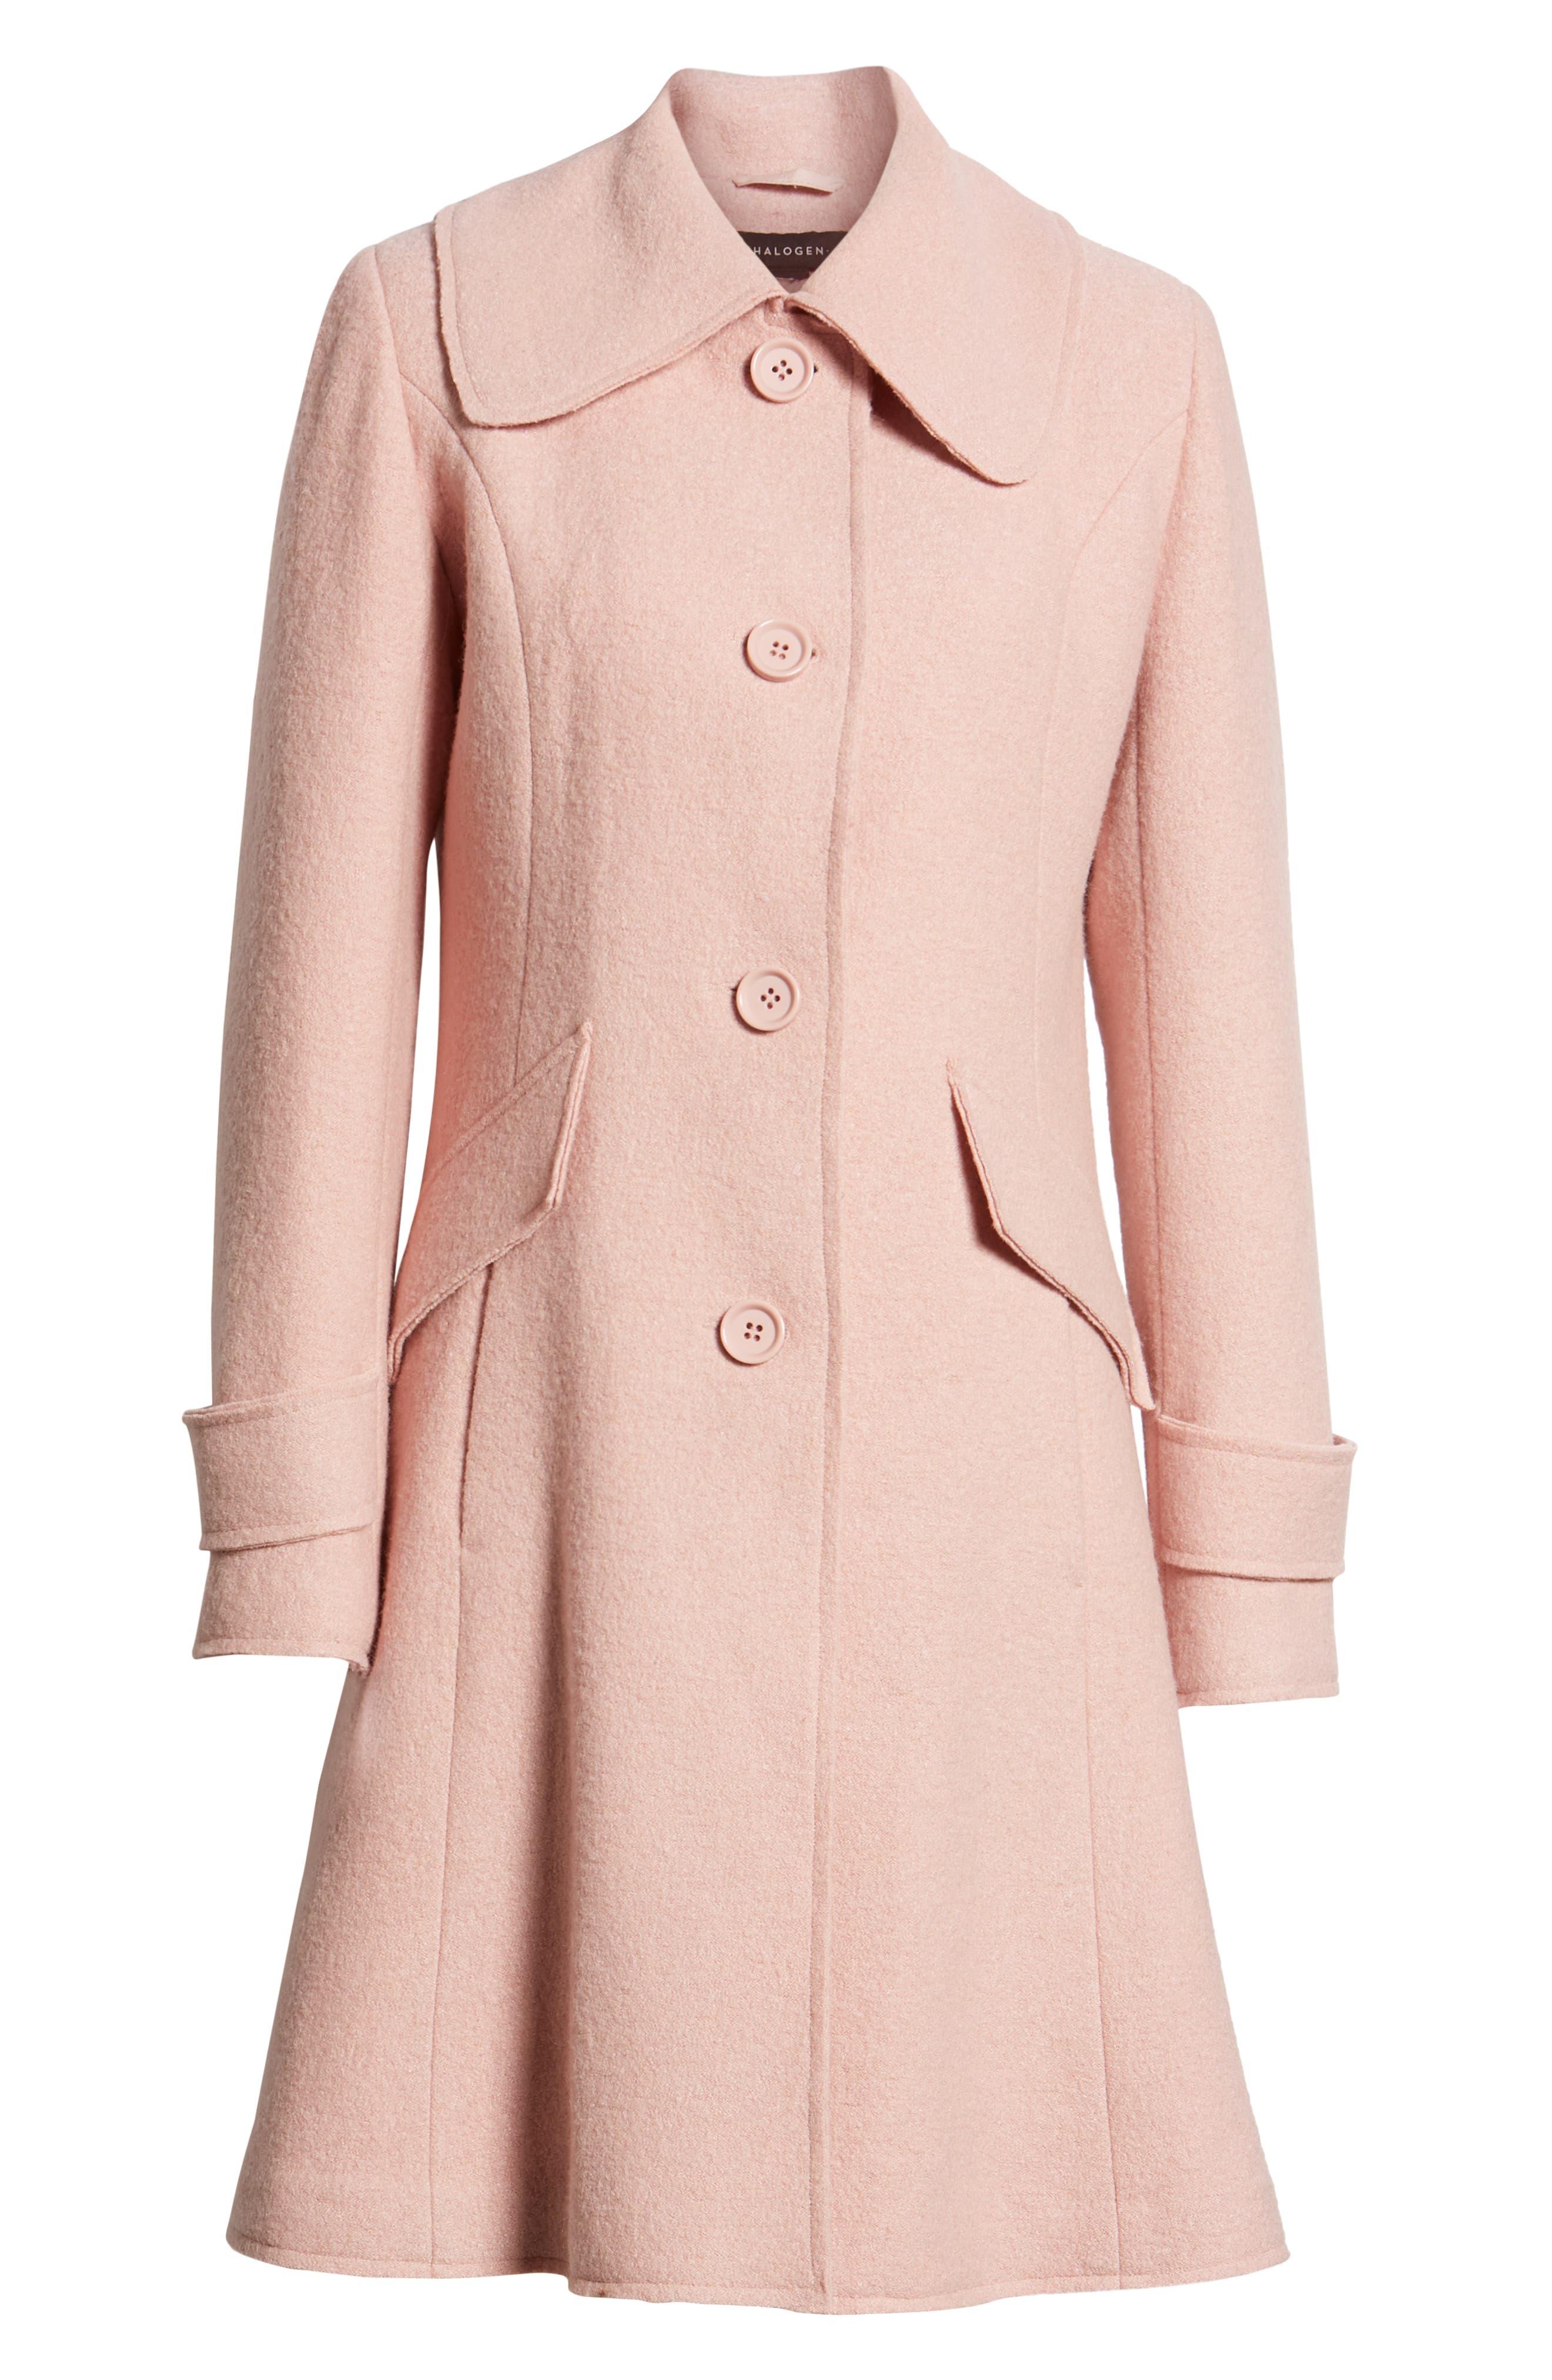 Boiled Wool Blend Fit & Flare Coat,                             Alternate thumbnail 6, color,                             BLUSH